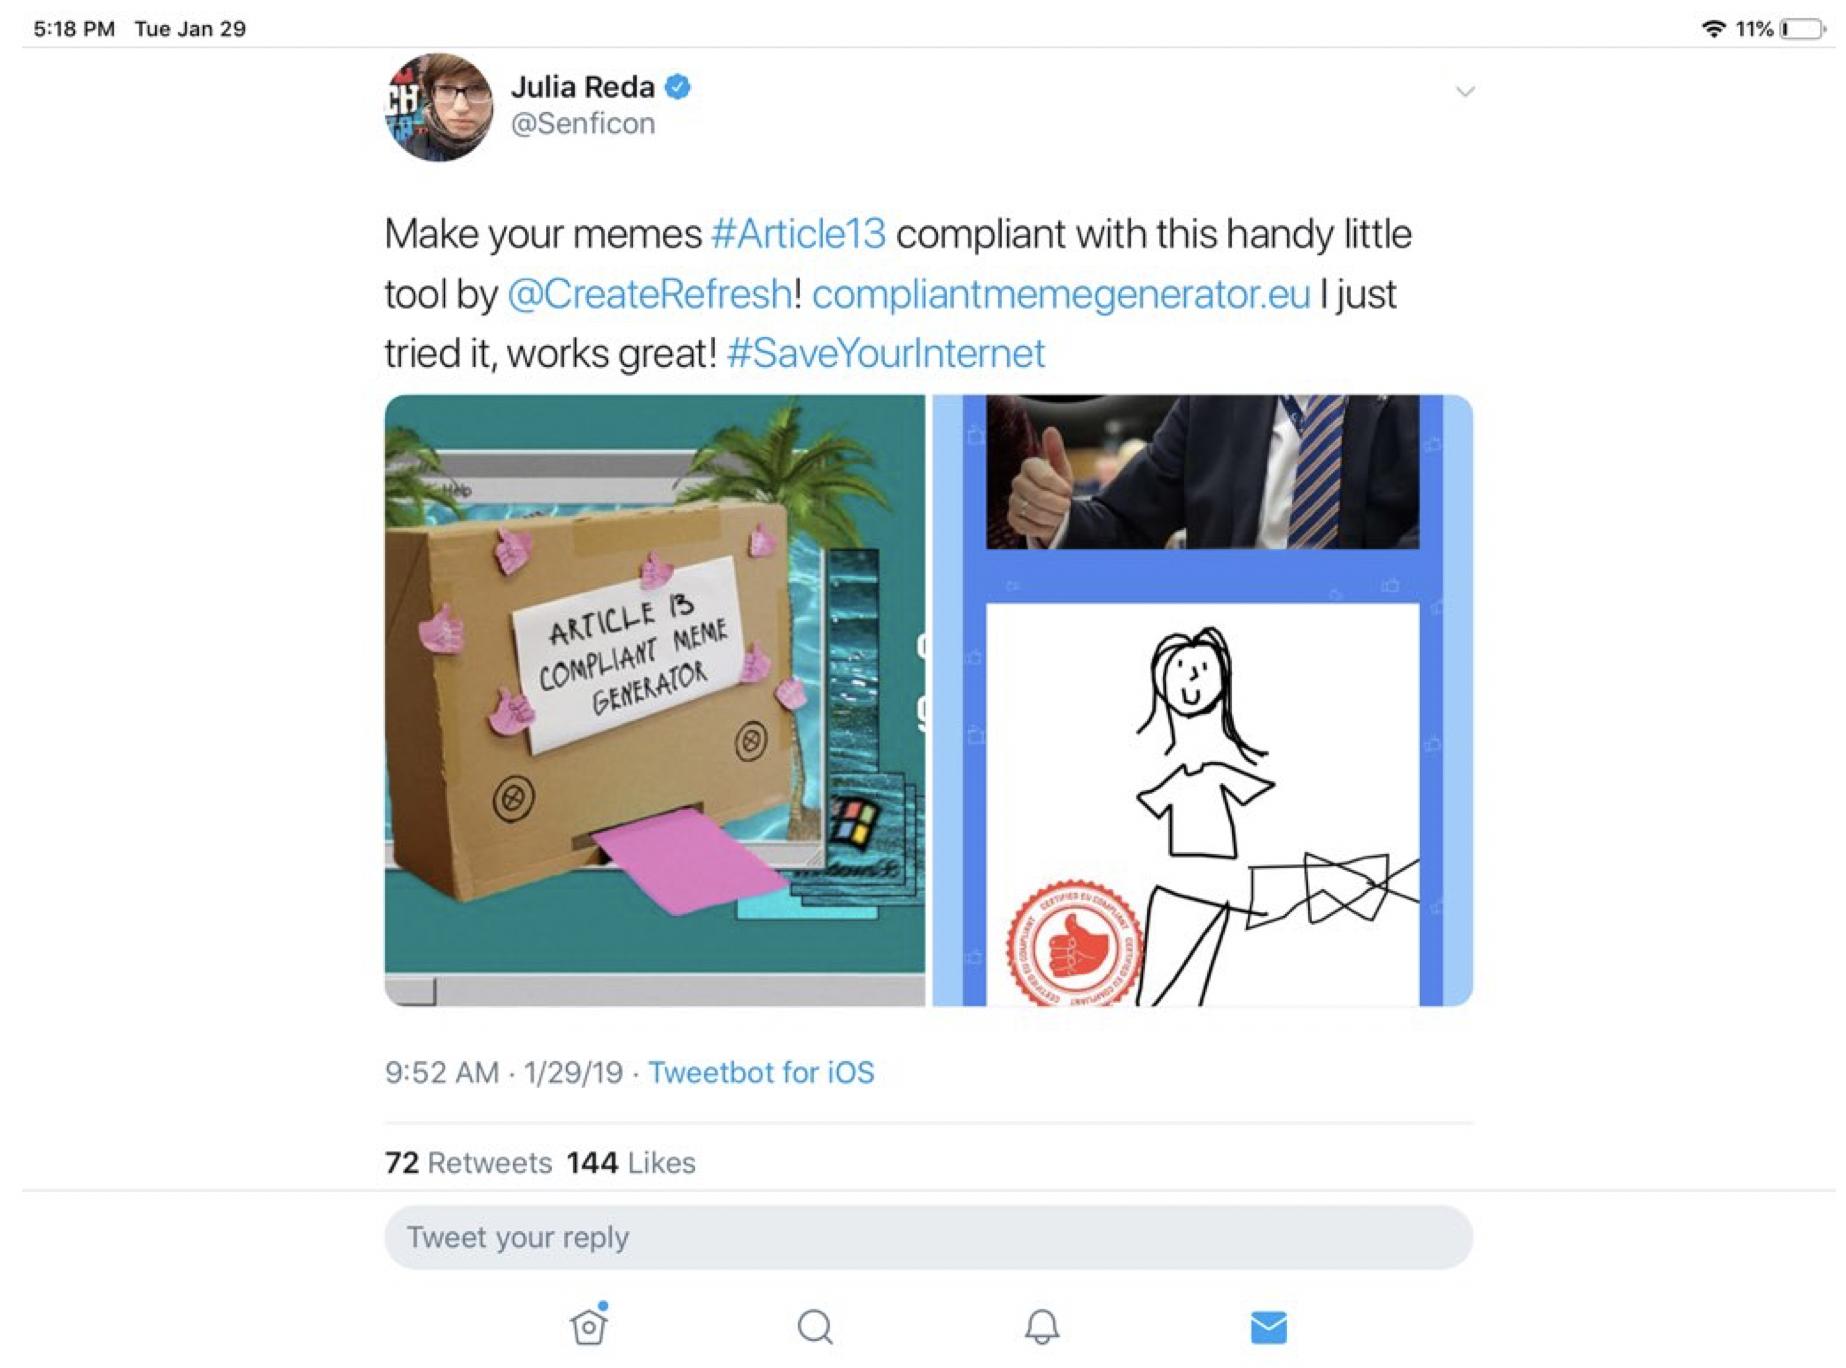 julia reda tweet.png